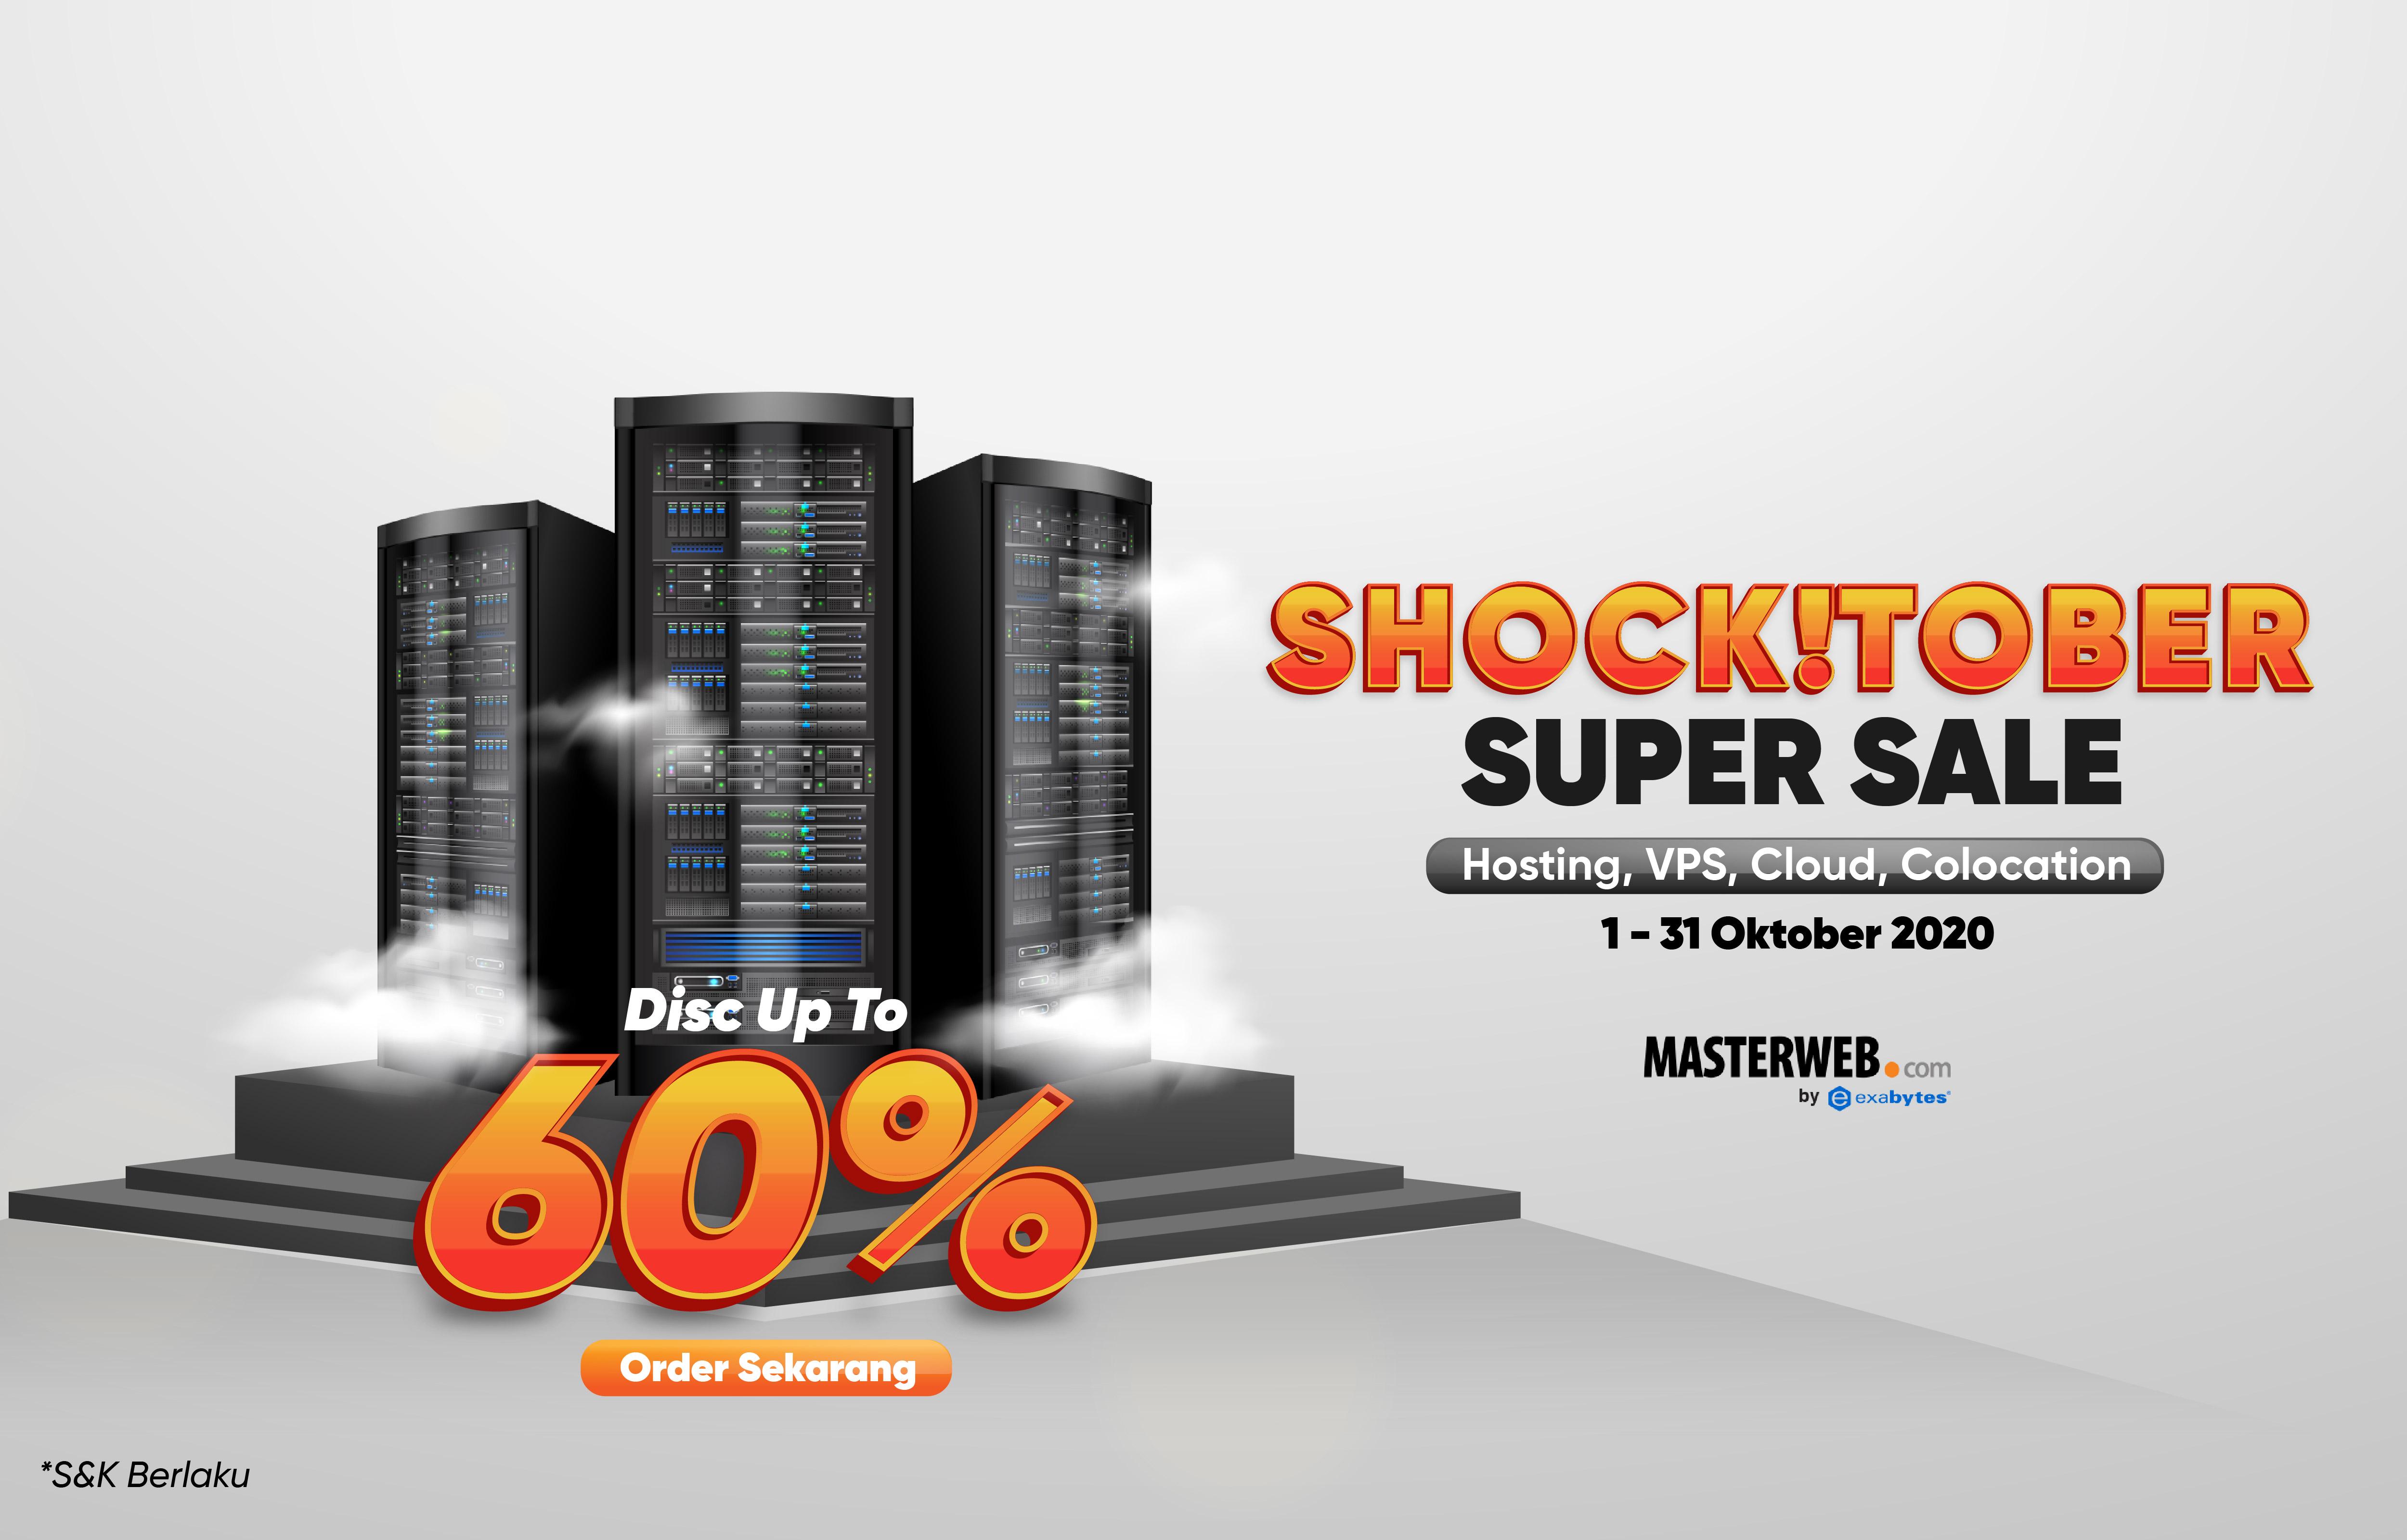 SHOCKTOBER Super Sale